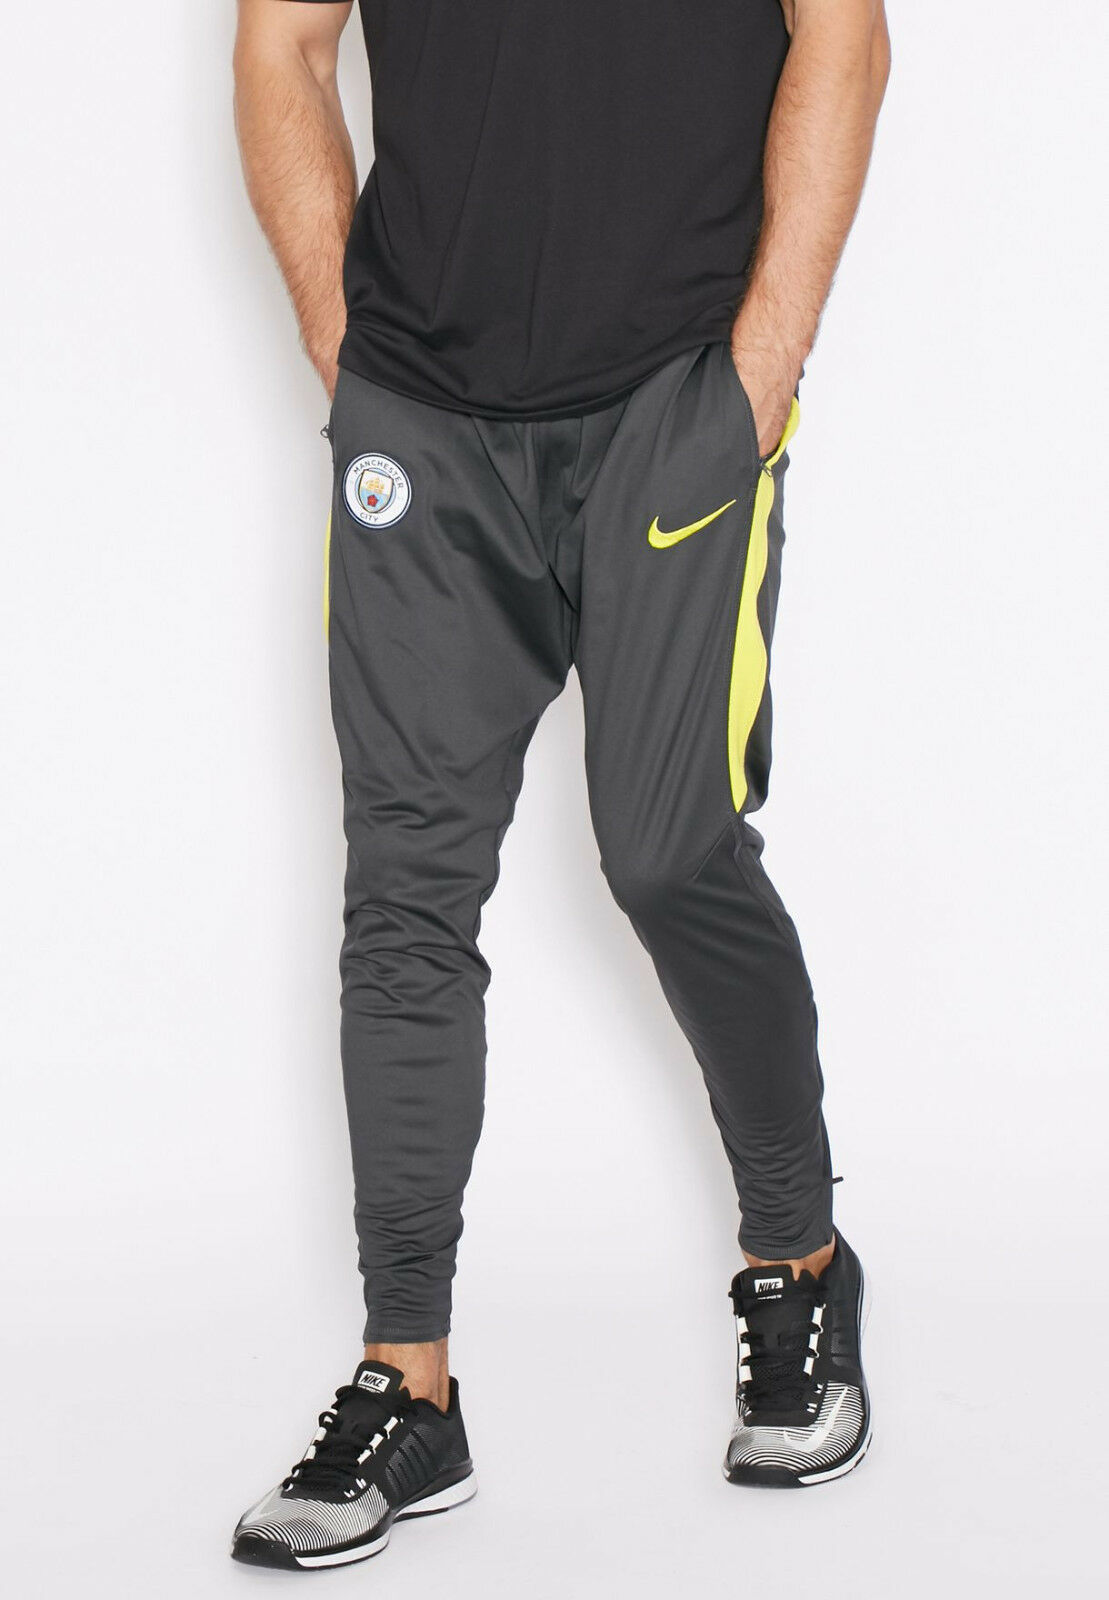 Nike 2016-2017 Uomo City Squad Squad Squad Training Pants Grigio Taglia S 809707 060 51f1d9